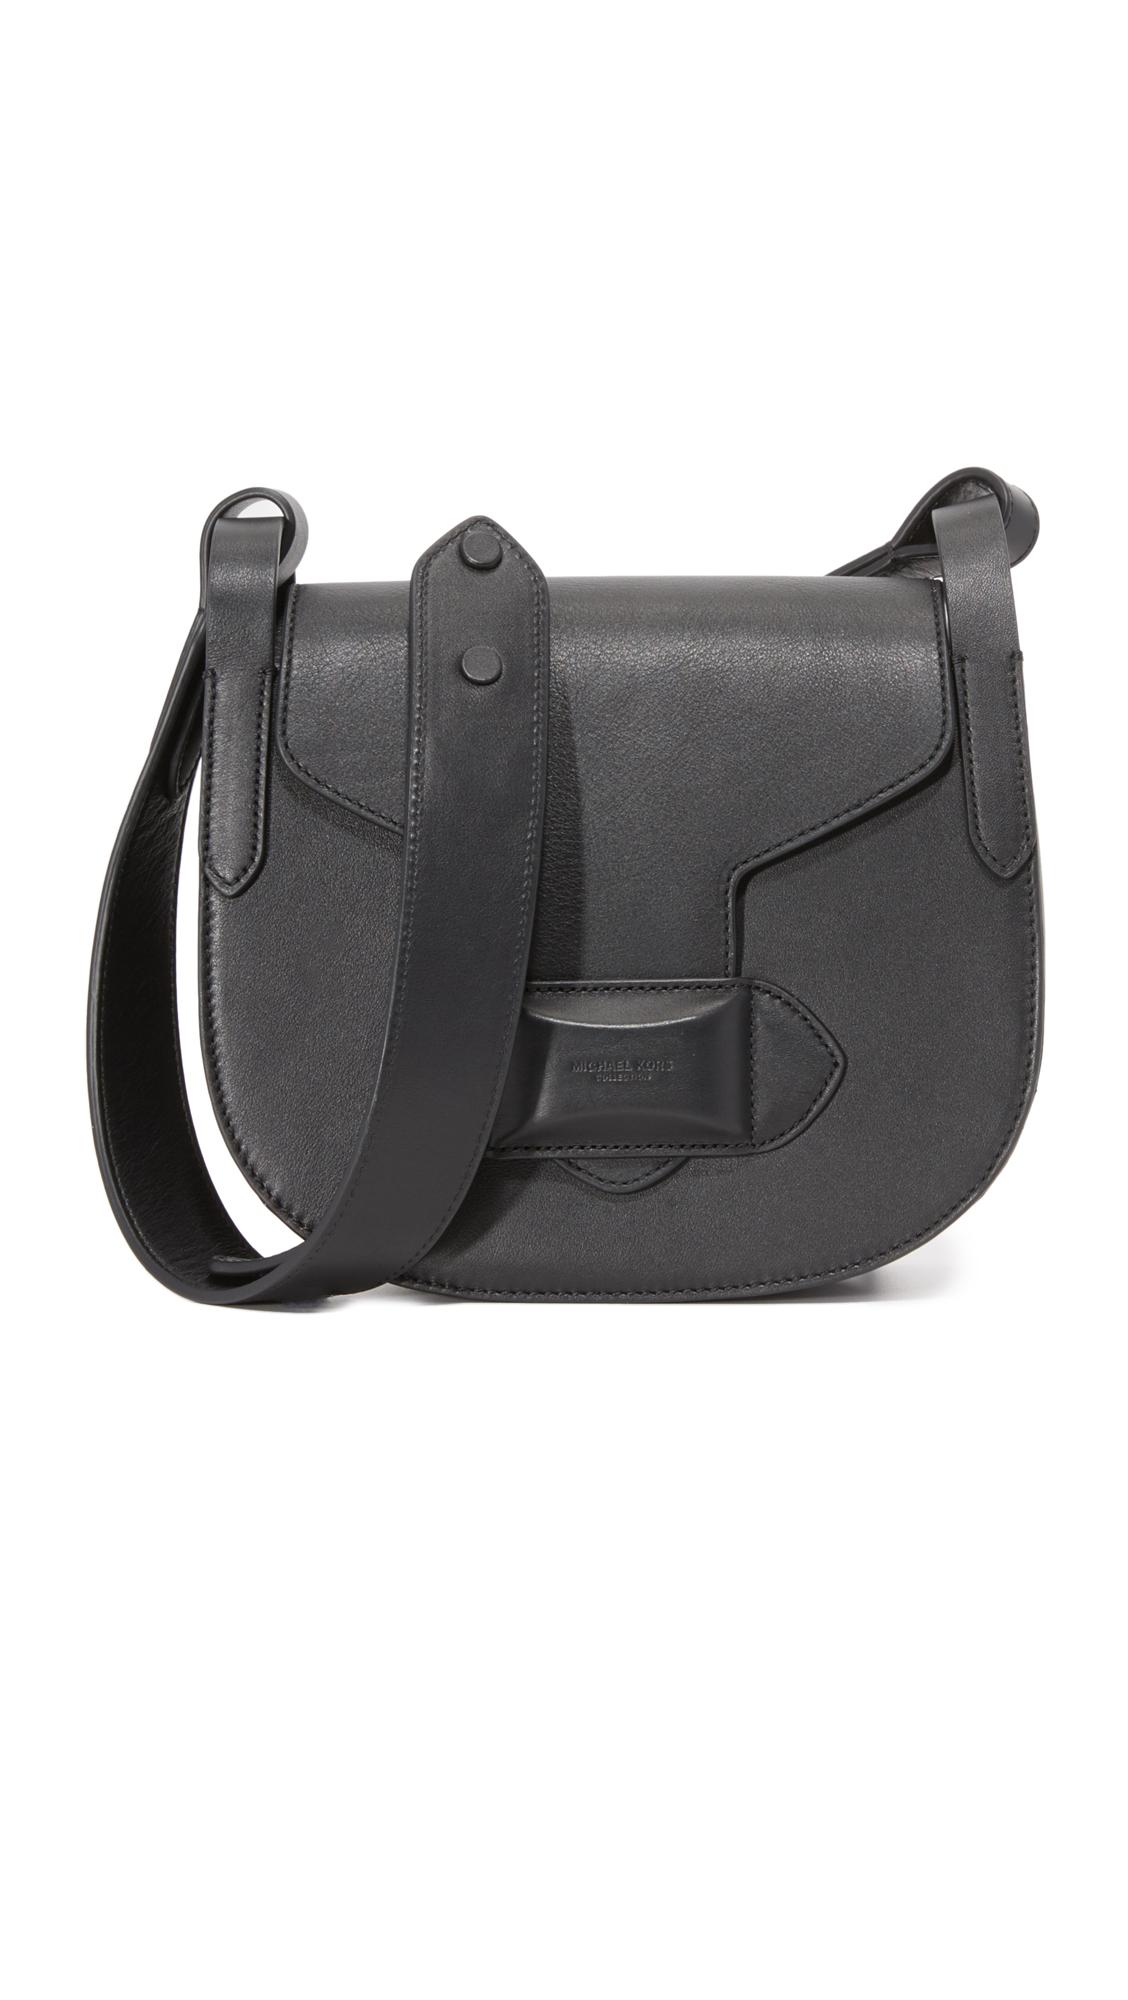 michael kors female 188971 michael kors collection daria small cross body saddle bag black